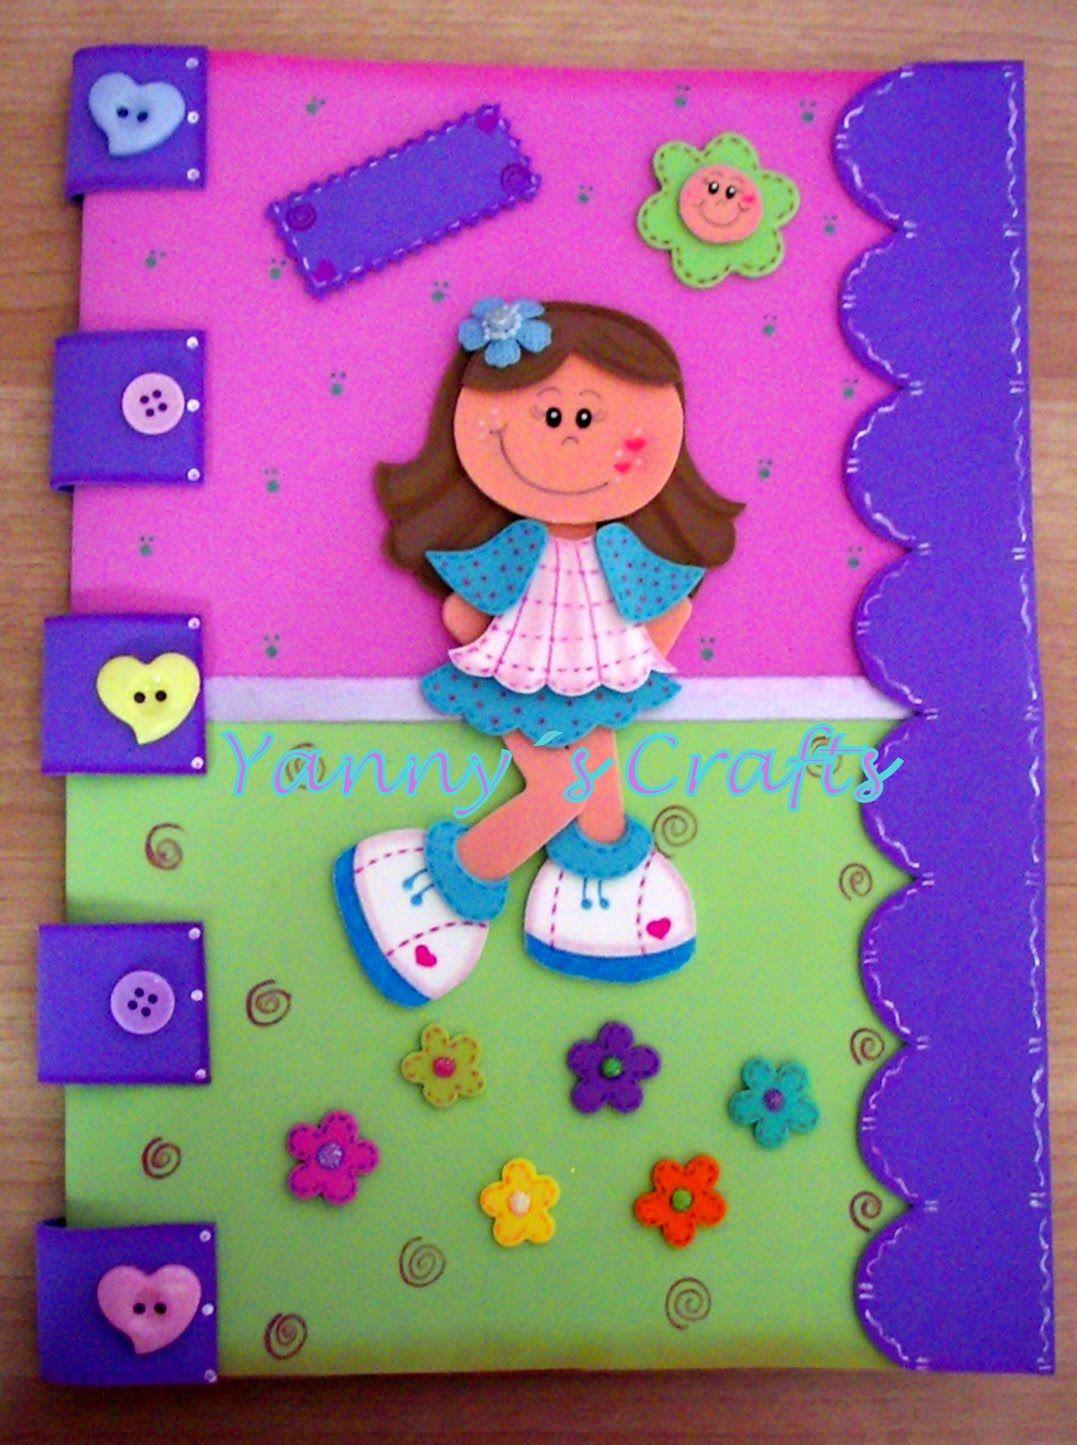 Yanny s crafts carpeta decorada fofuchas planas - Goma eva decorada ...